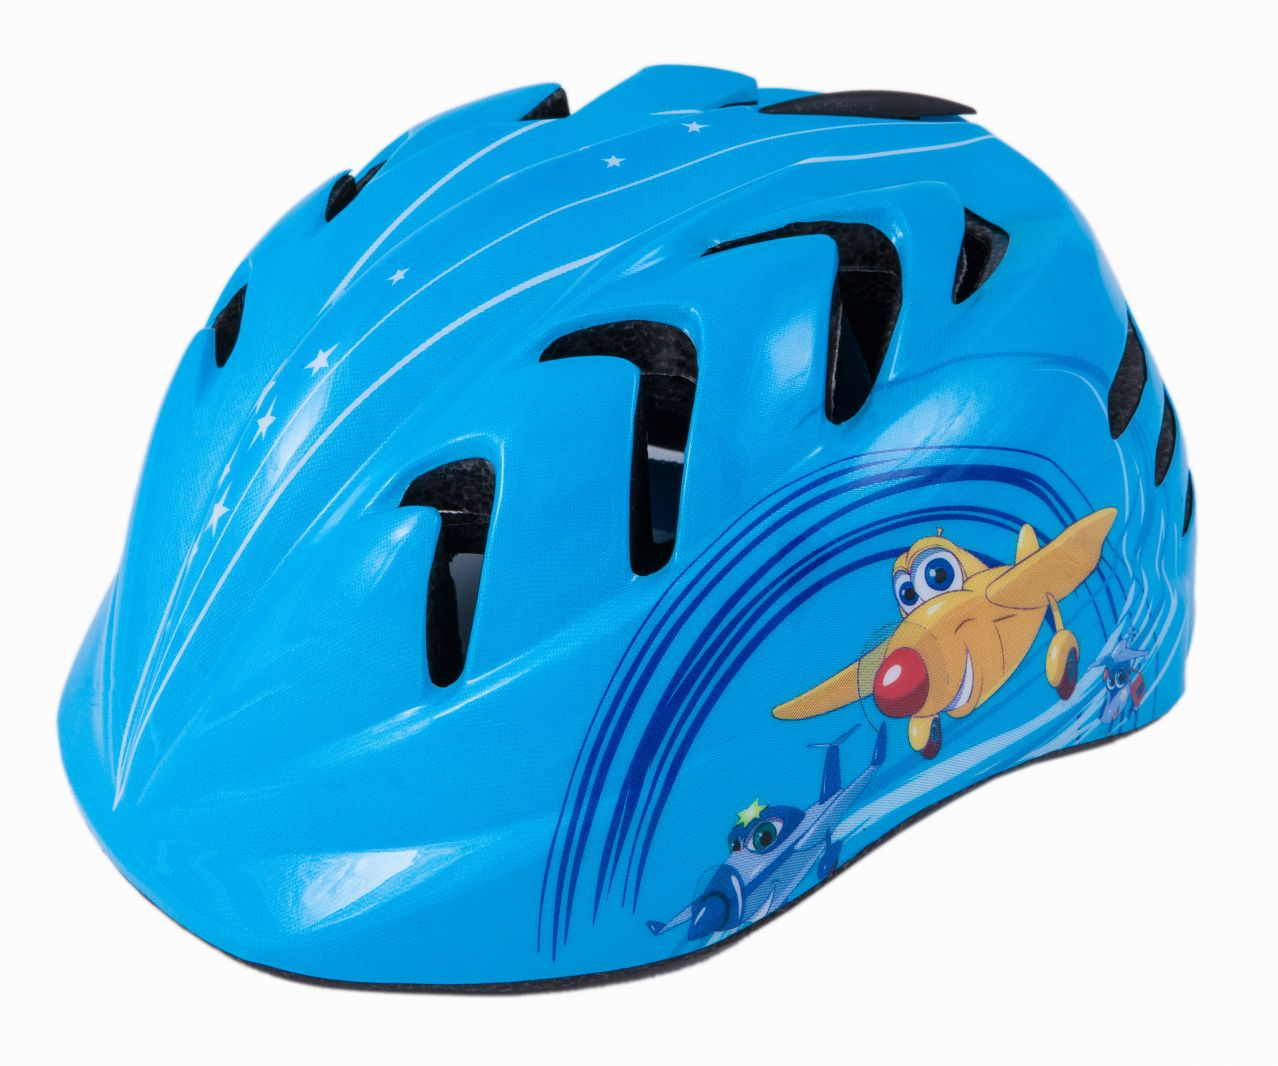 Вело Шлем VSH 7 planes детский синий, р.M от Ravta